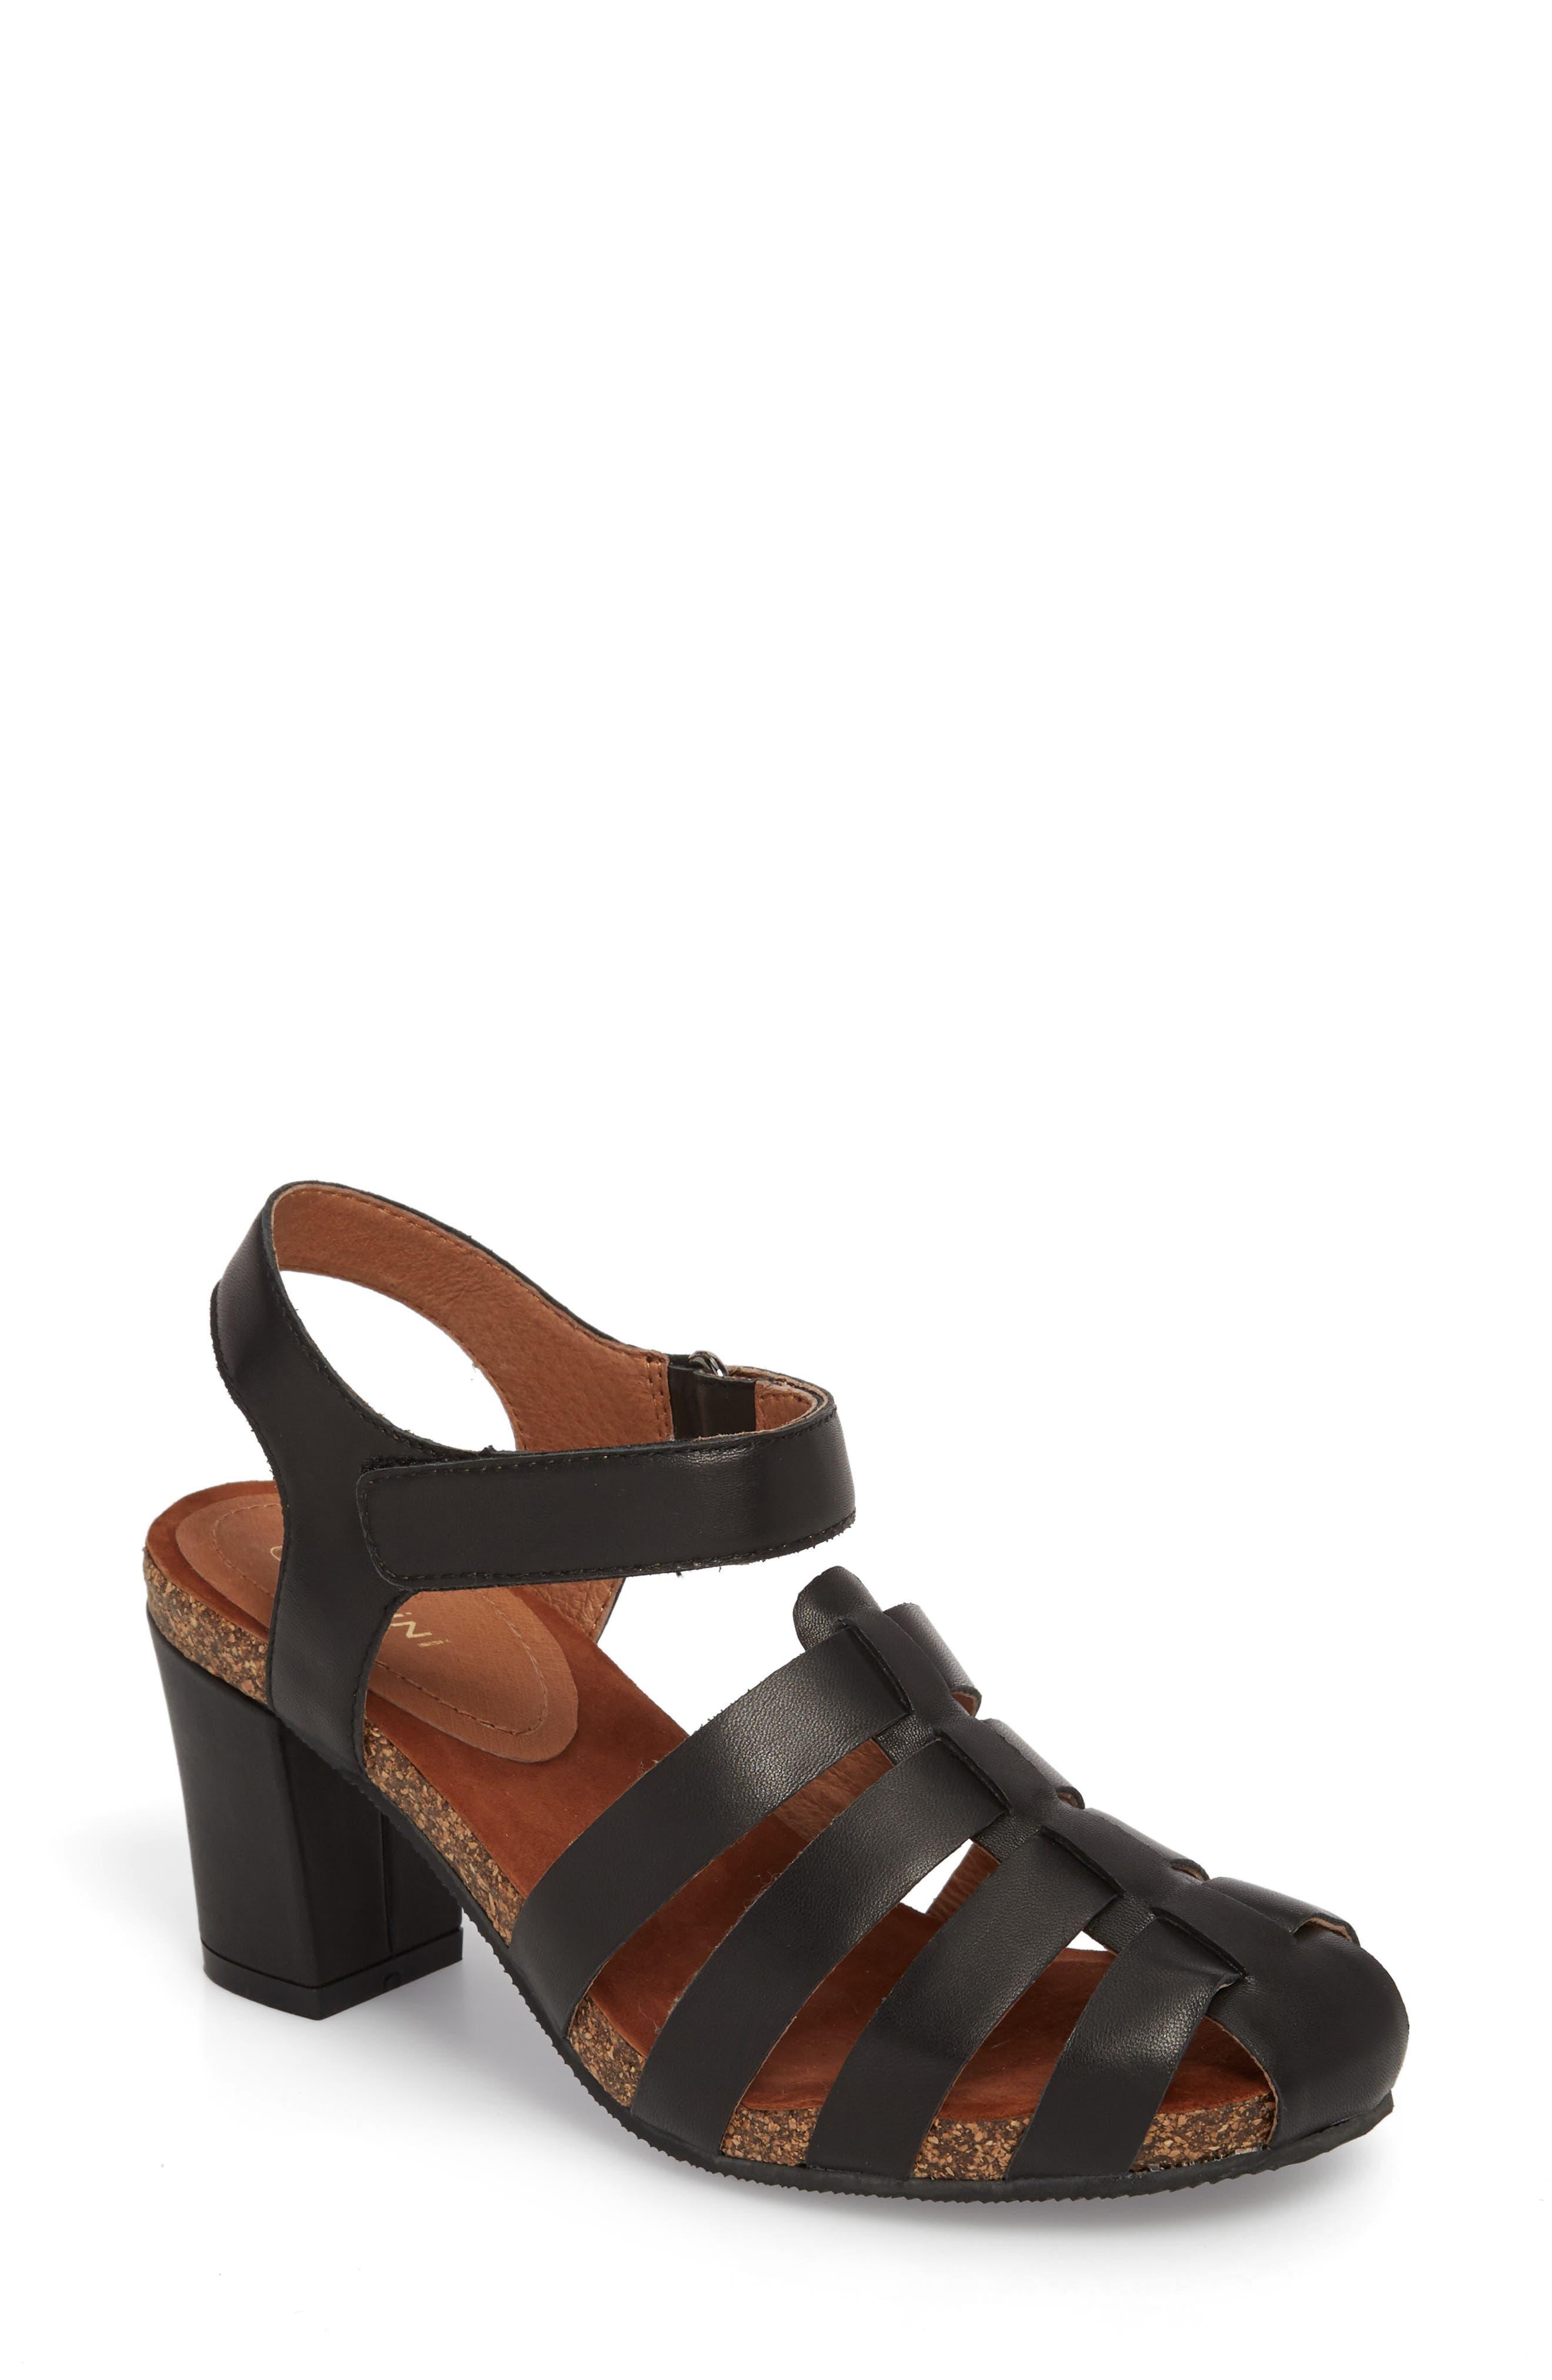 Carrara Block Heel Sandal, Main, color, BLACK LEATHER